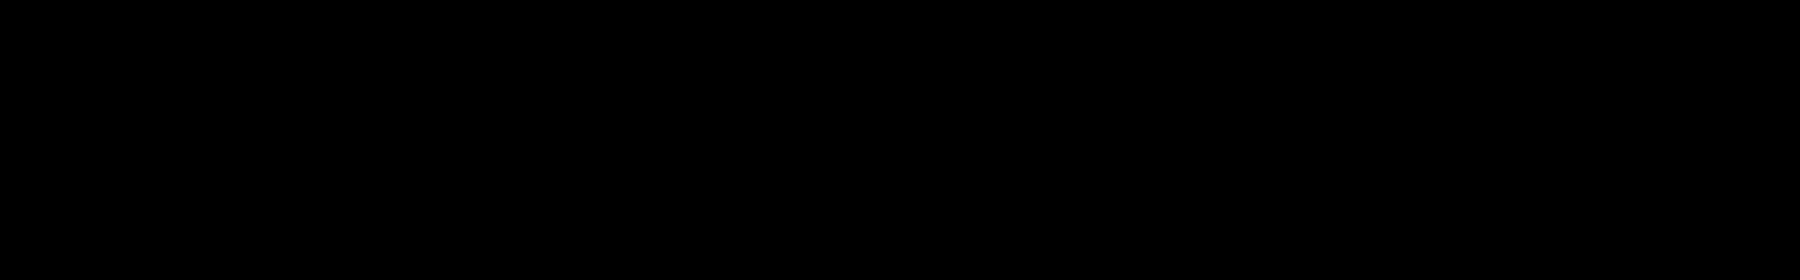 EDM Megapack audio waveform